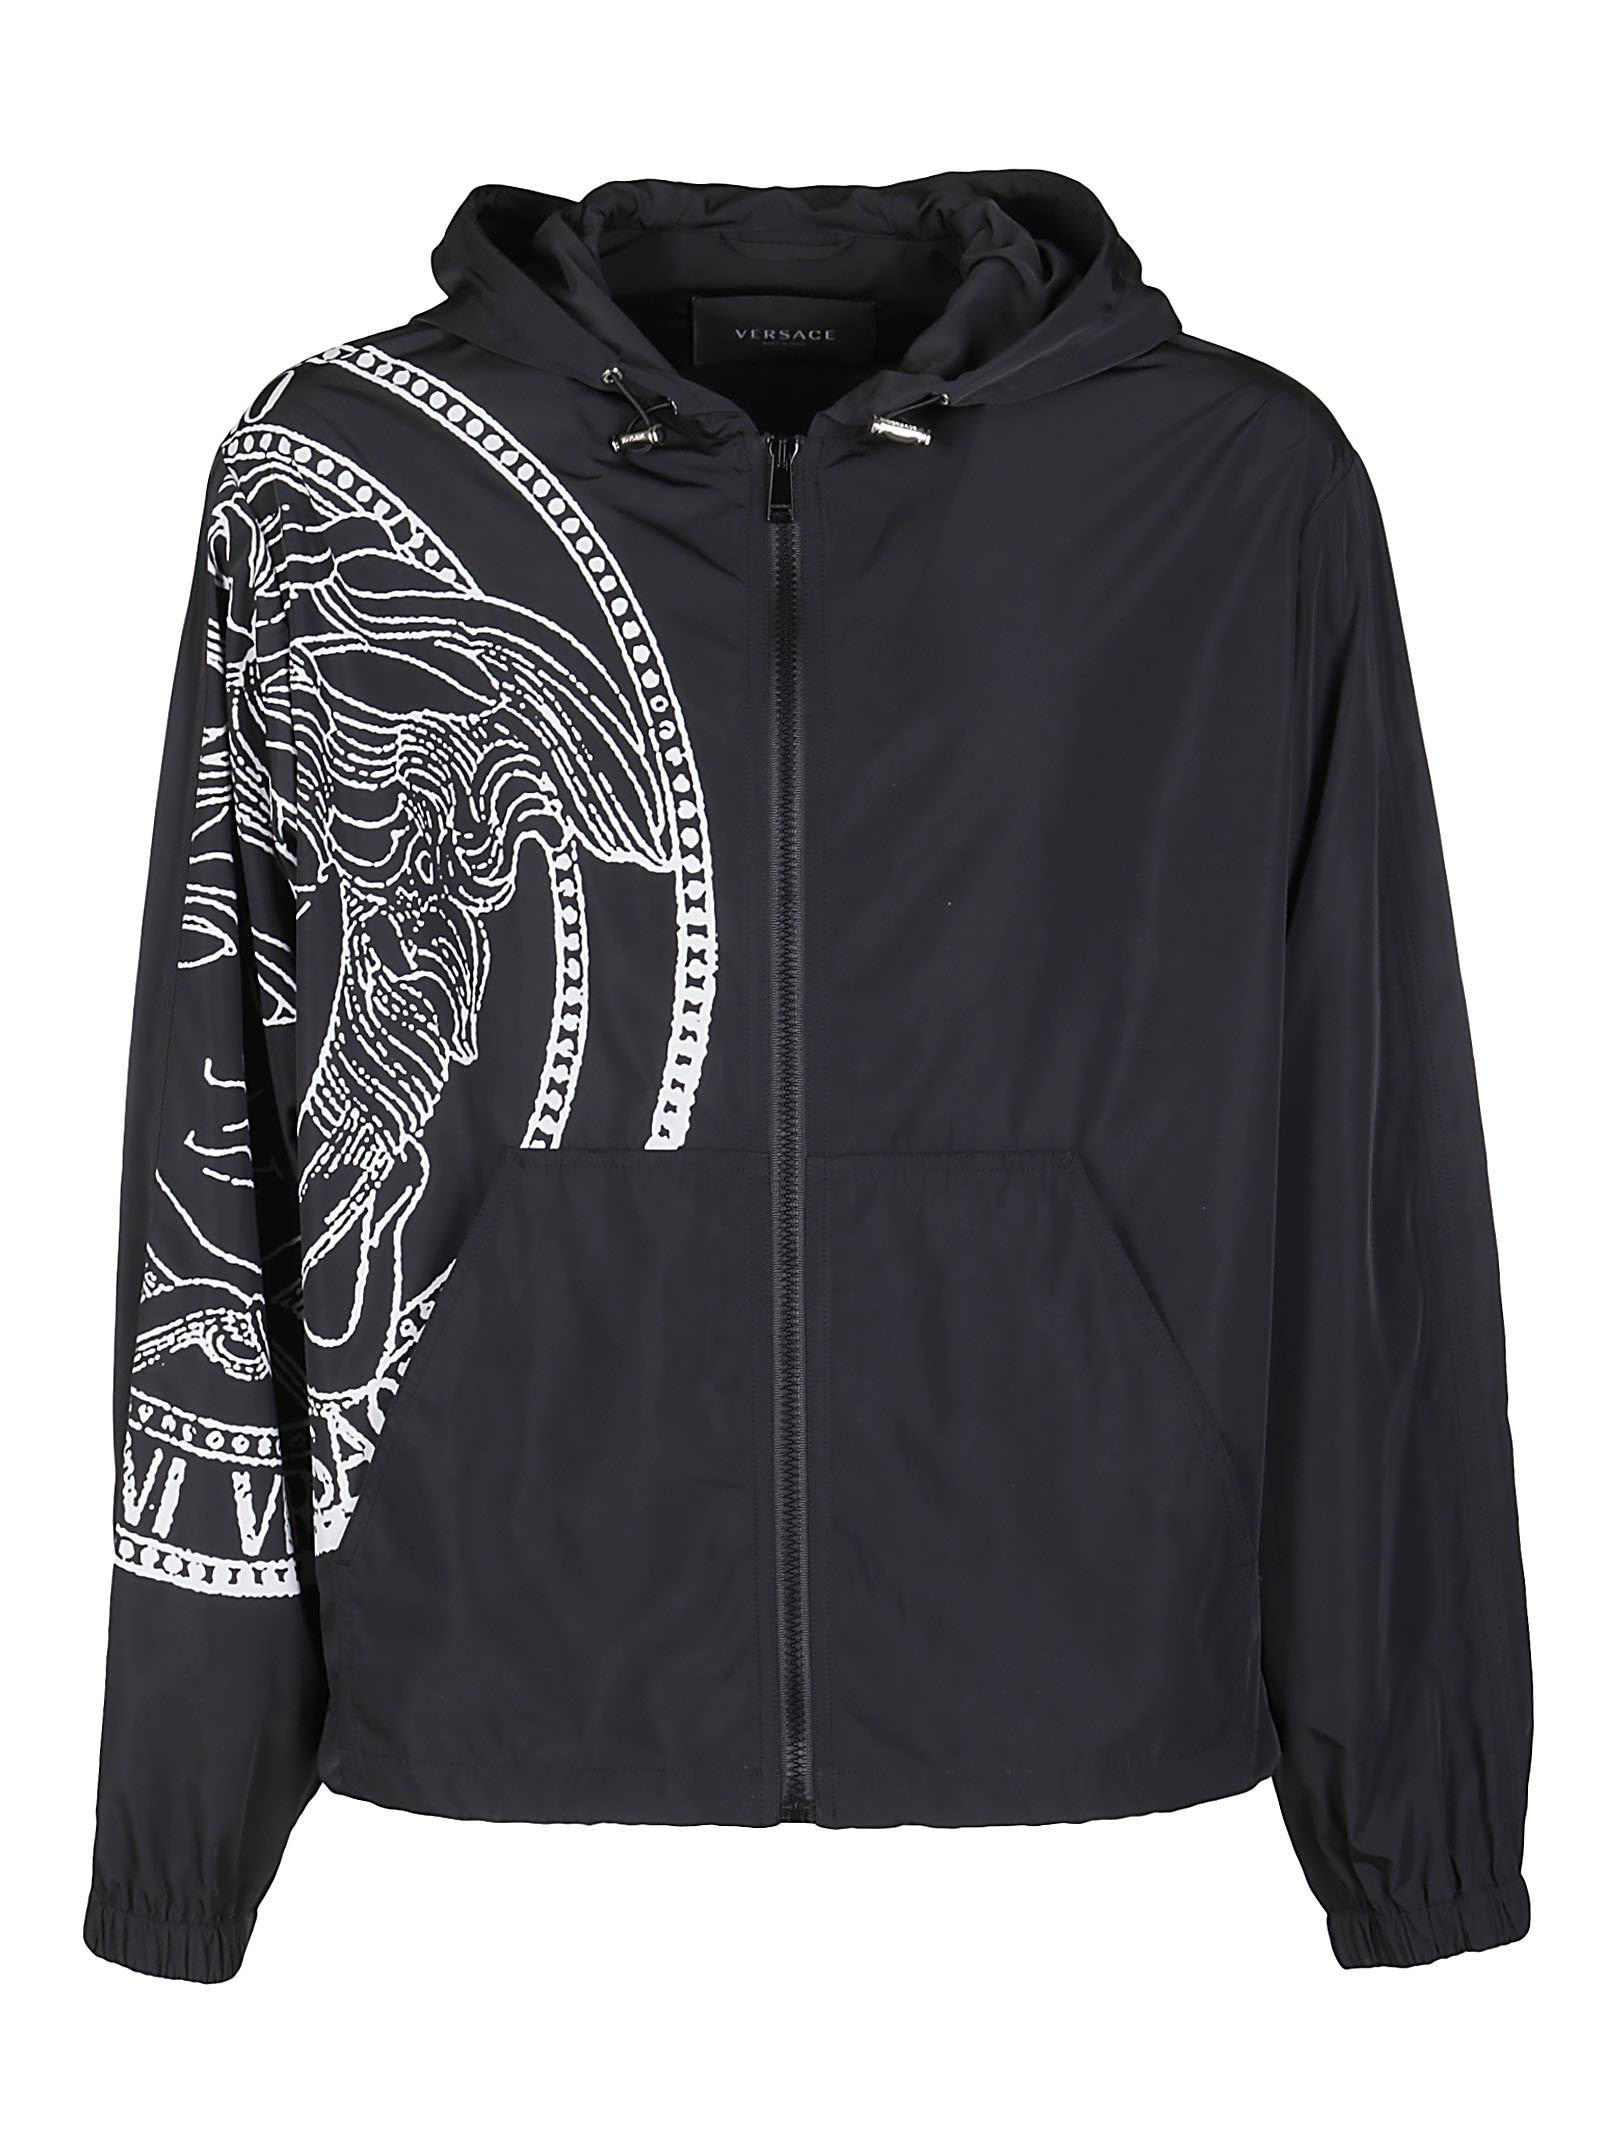 Versace Clothing BLACK RAINPROOF JACKET